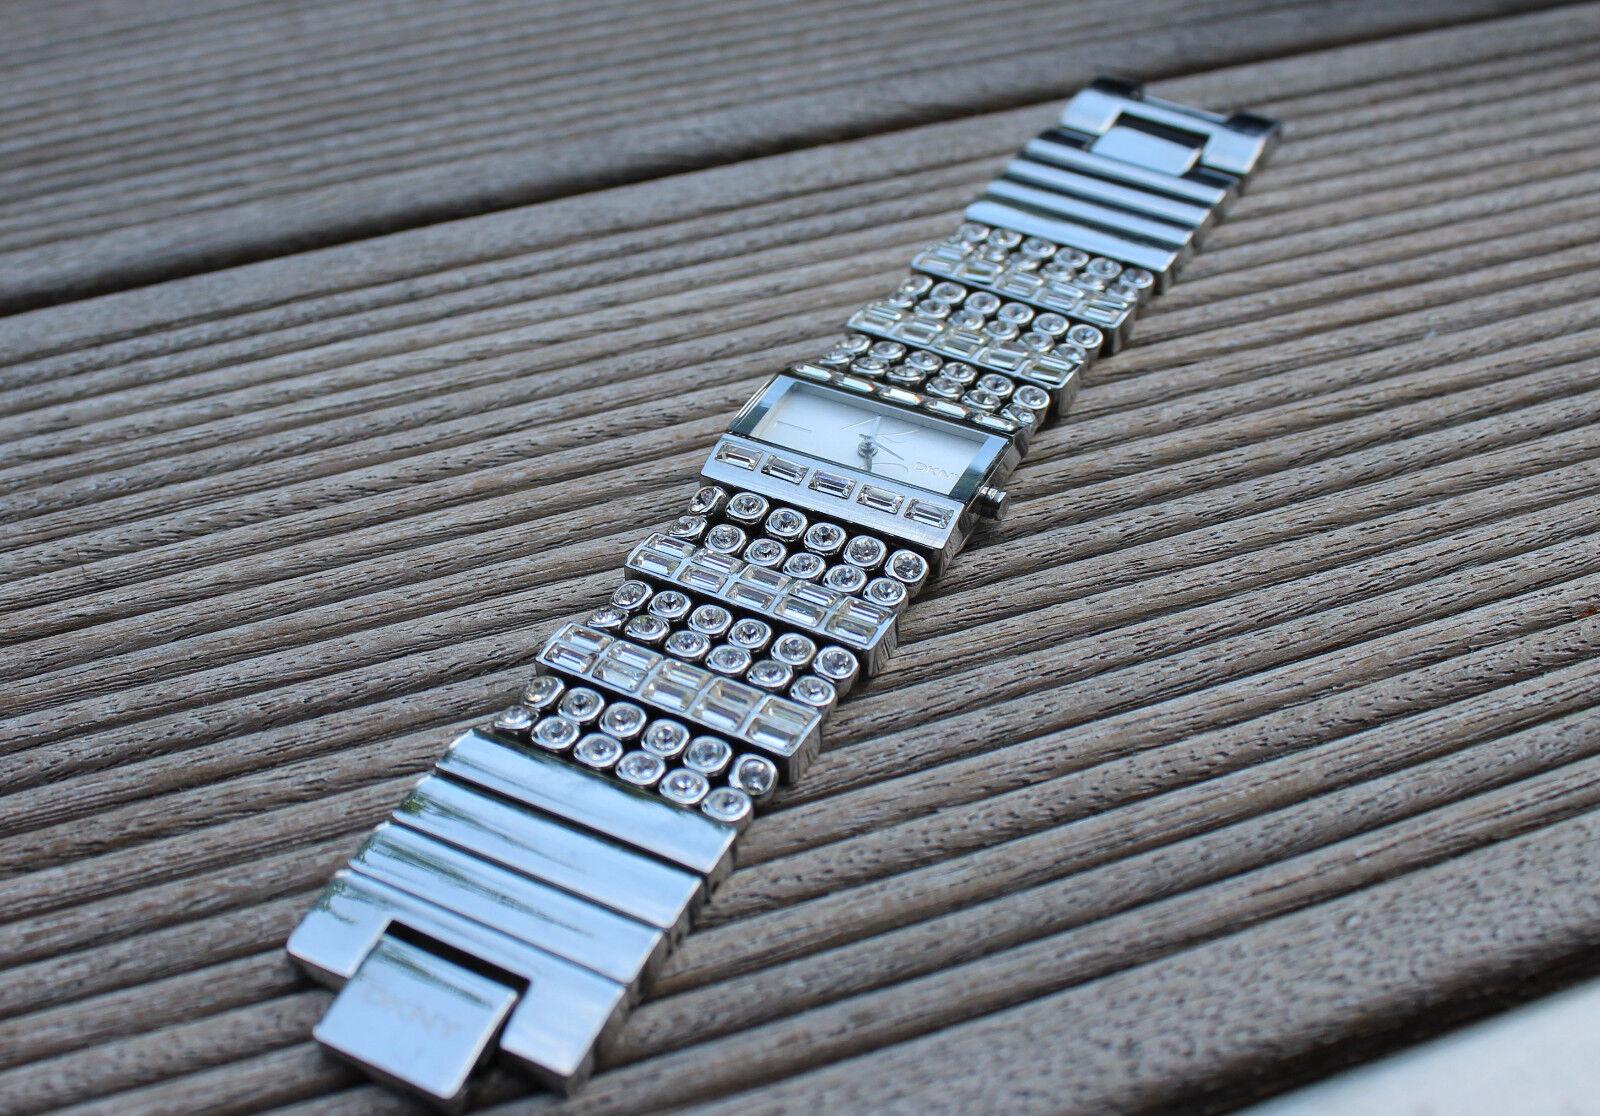 DKNY Uhr Damen silber eckig Strass Glitzer Accessoires Schmuck Neuwertig